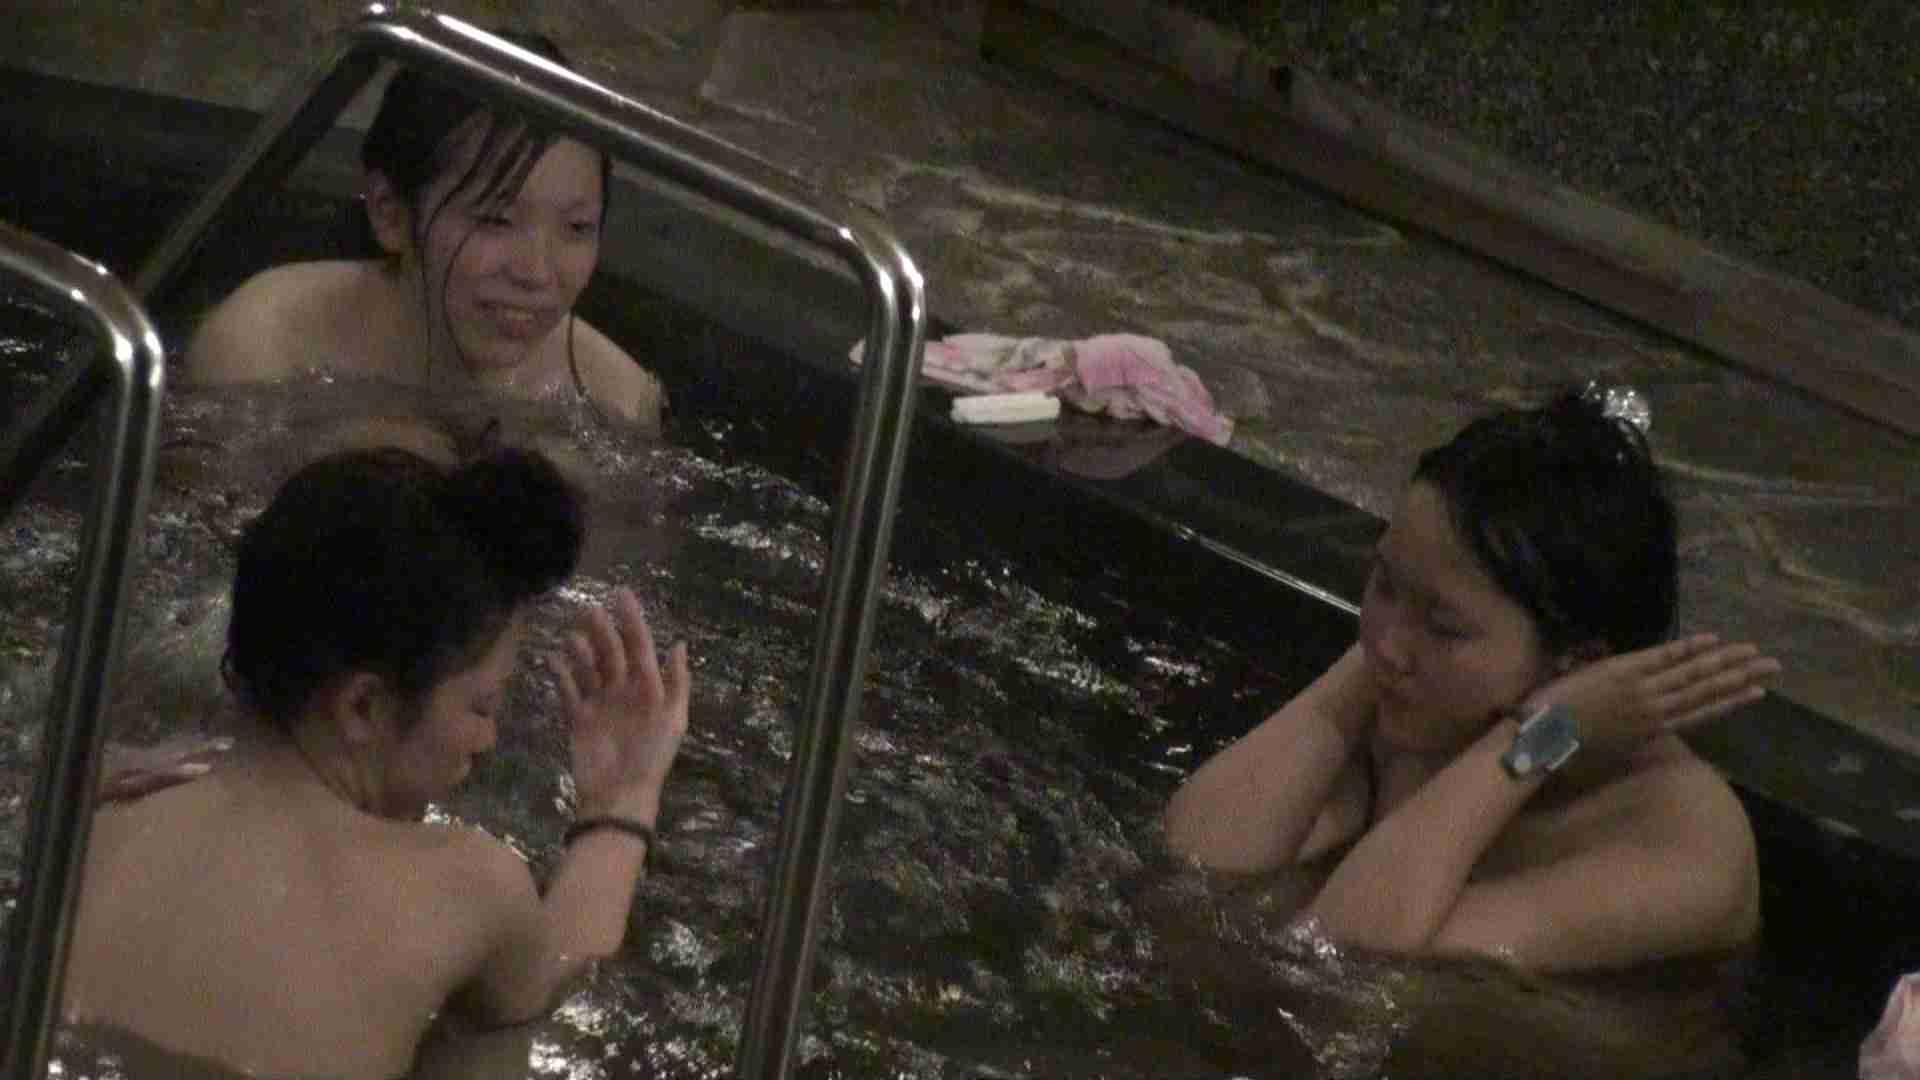 Aquaな露天風呂Vol.383 露天 オマンコ無修正動画無料 79連発 4